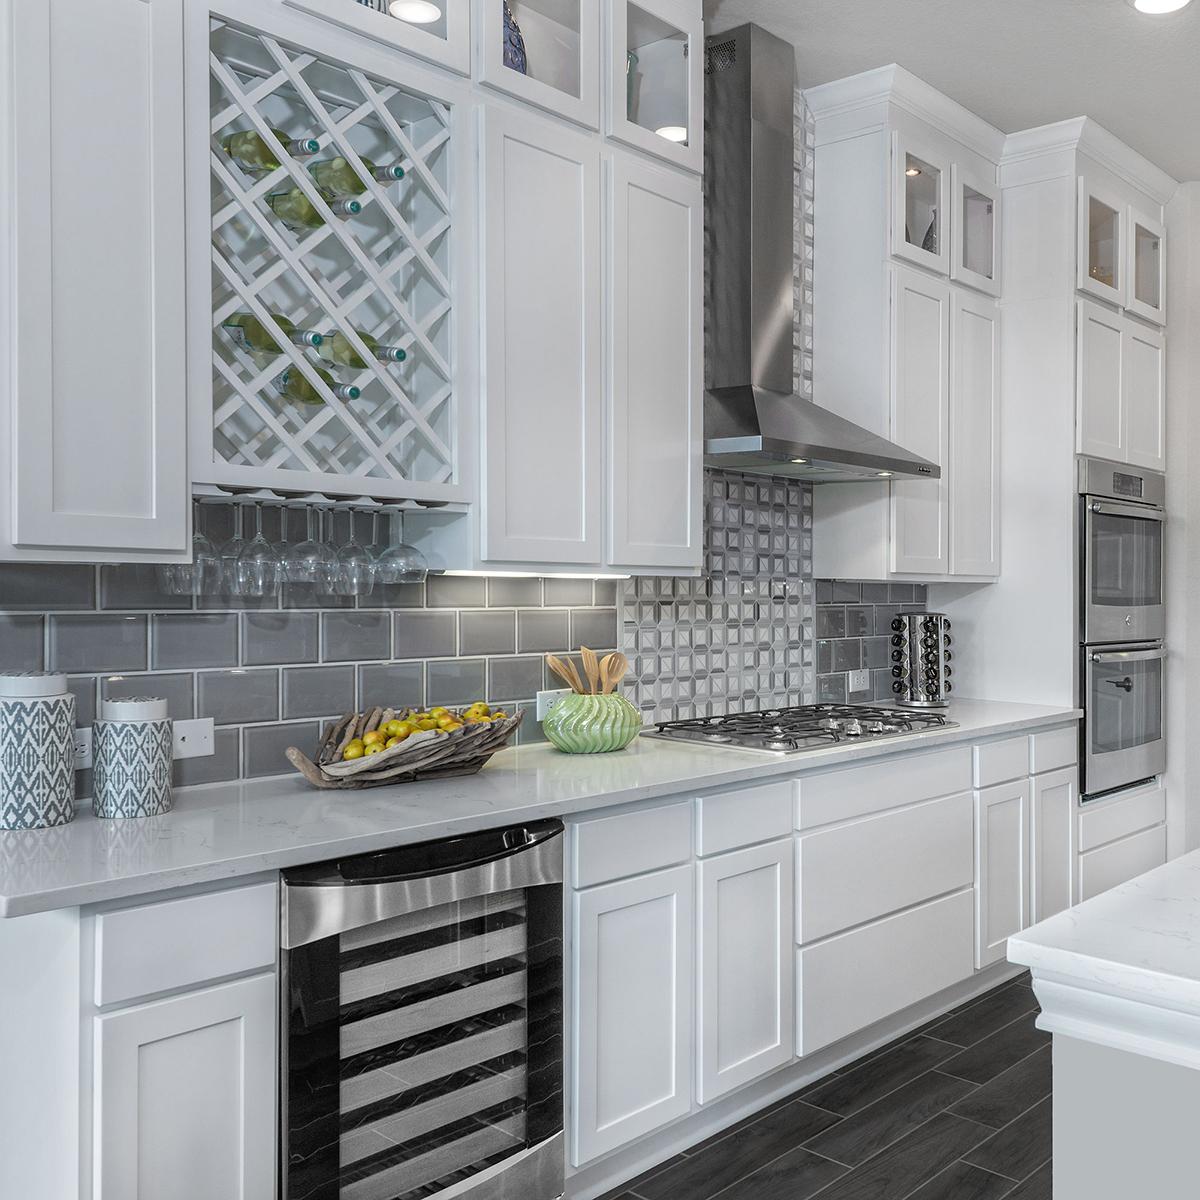 Bj Tidwell Cabinets From Advanced Interiors West Michigan